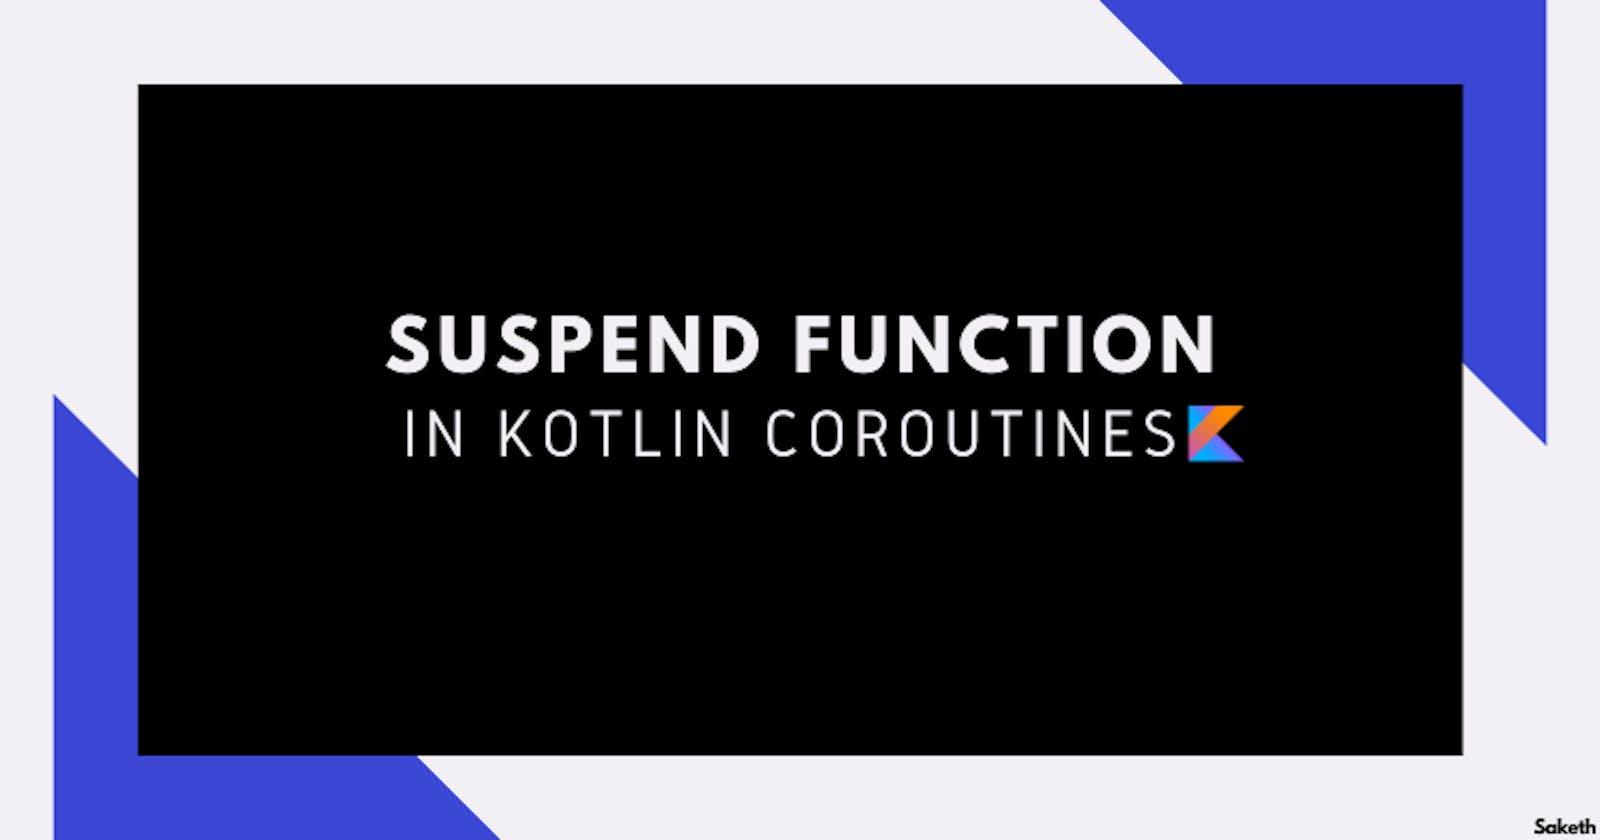 Suspend Function In Kotlin-Coroutines